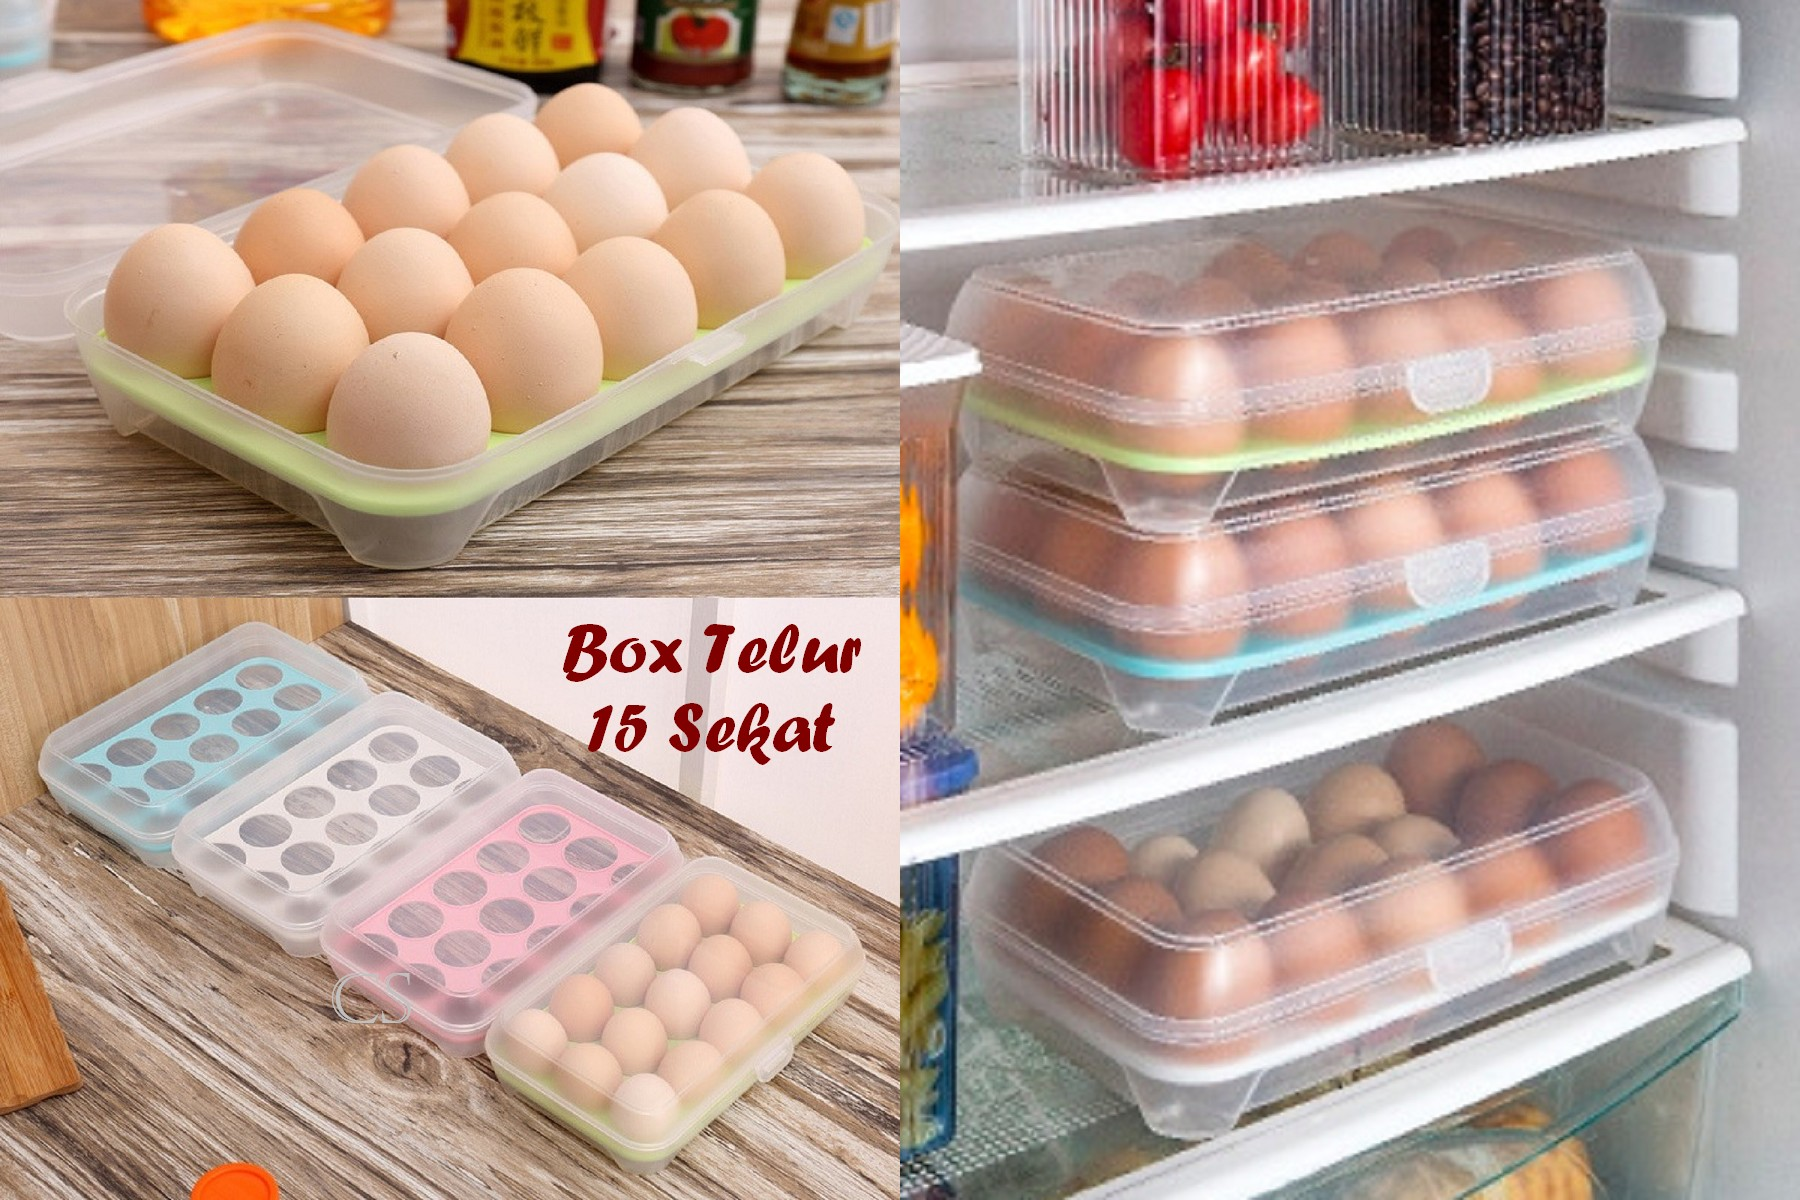 Kotak Penyimpanan Telur Kapasitas 10 Pcs Daftar Harga Terbaru Dan Libi Microgynon Box Isi Jual Egg Besar Tempat 15 Janethhousekitty Tokopedia